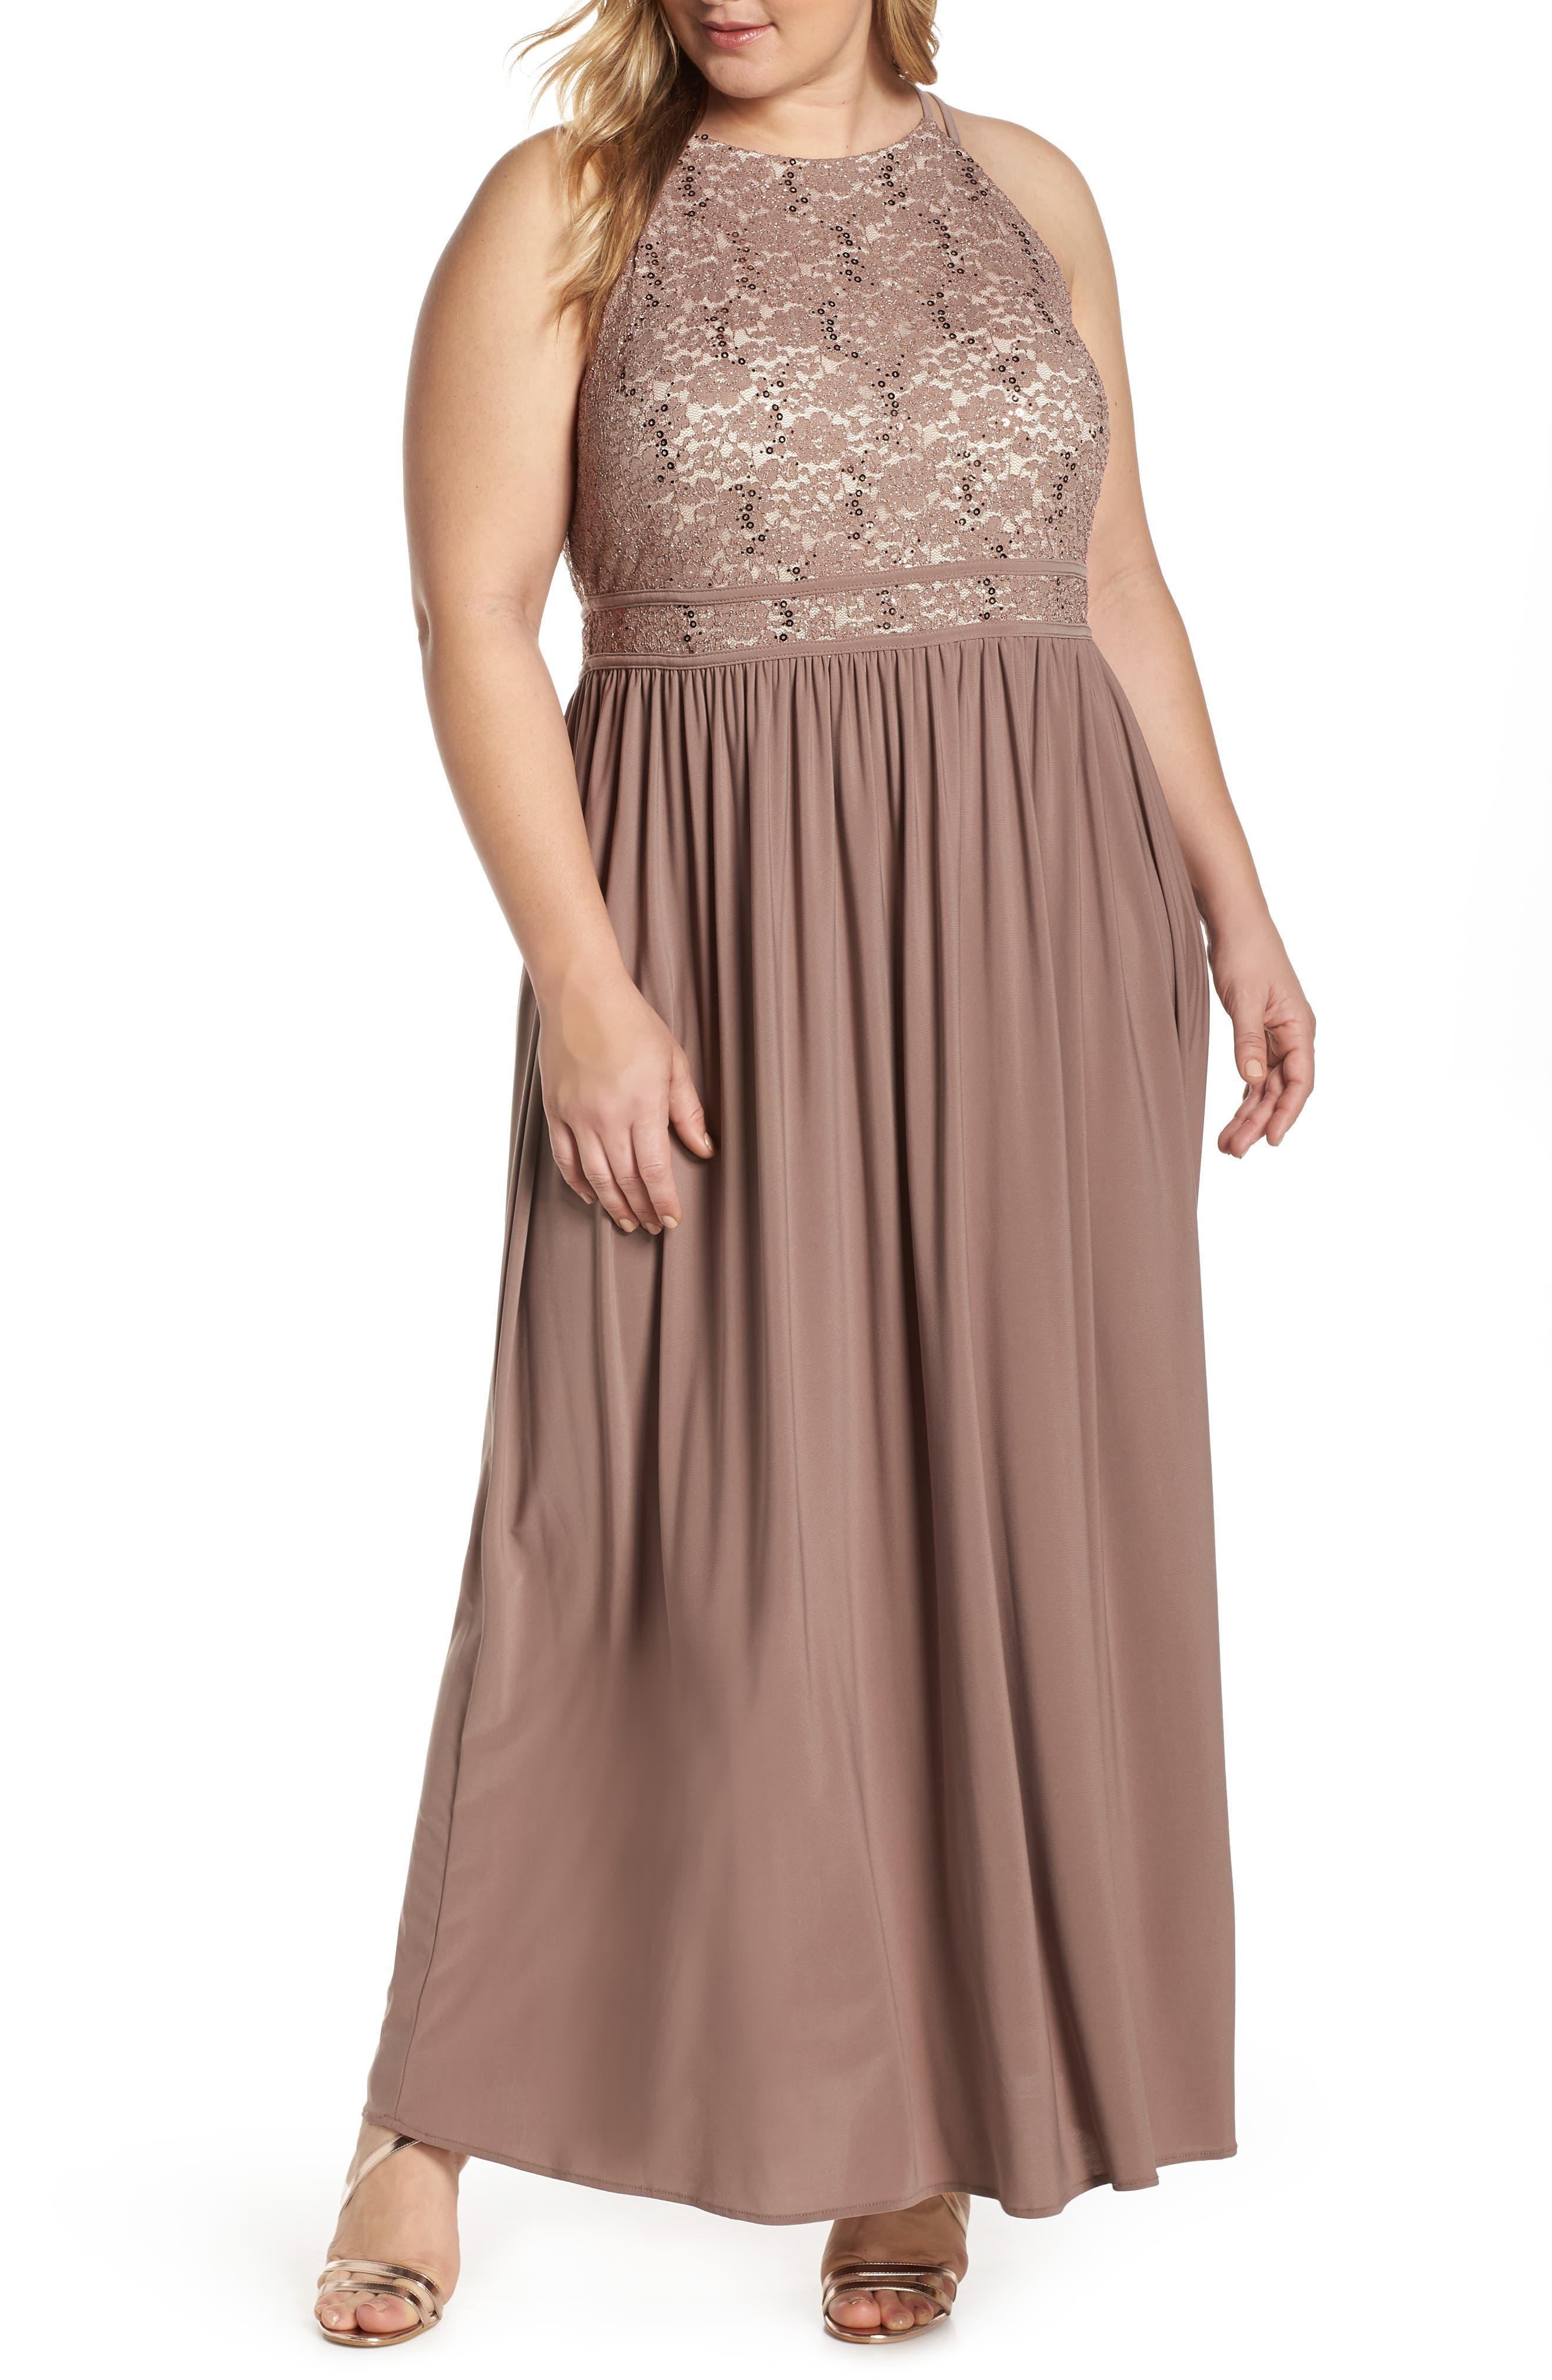 Plus Size Morgan & Co. Lace Bodice Evening Dress, Beige